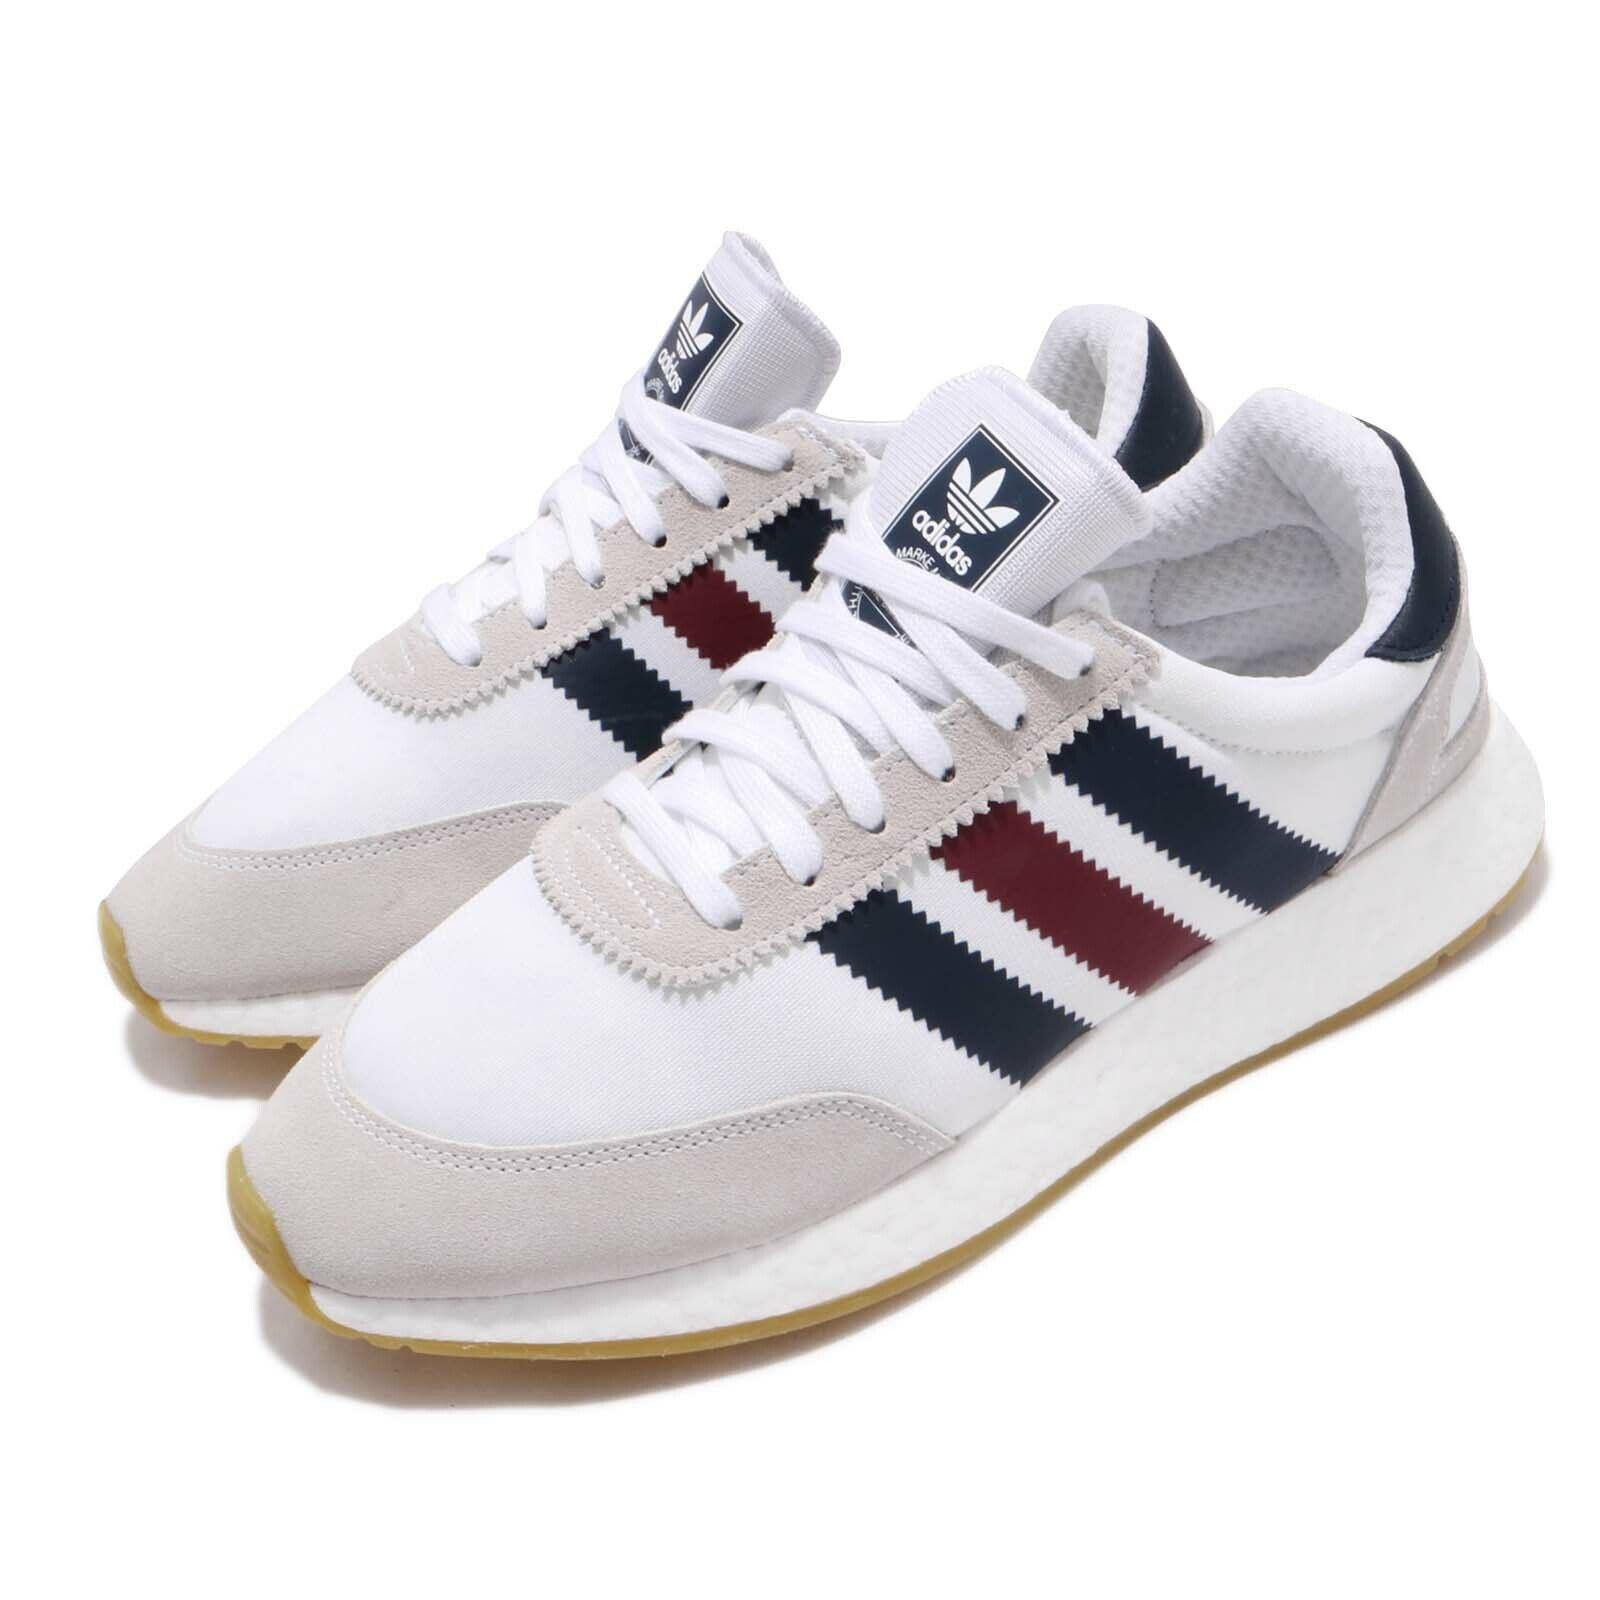 Adidas  Originals I -523 bianca Borgogna Navy Mens Running scarpe BOOST BD7813  prima i clienti